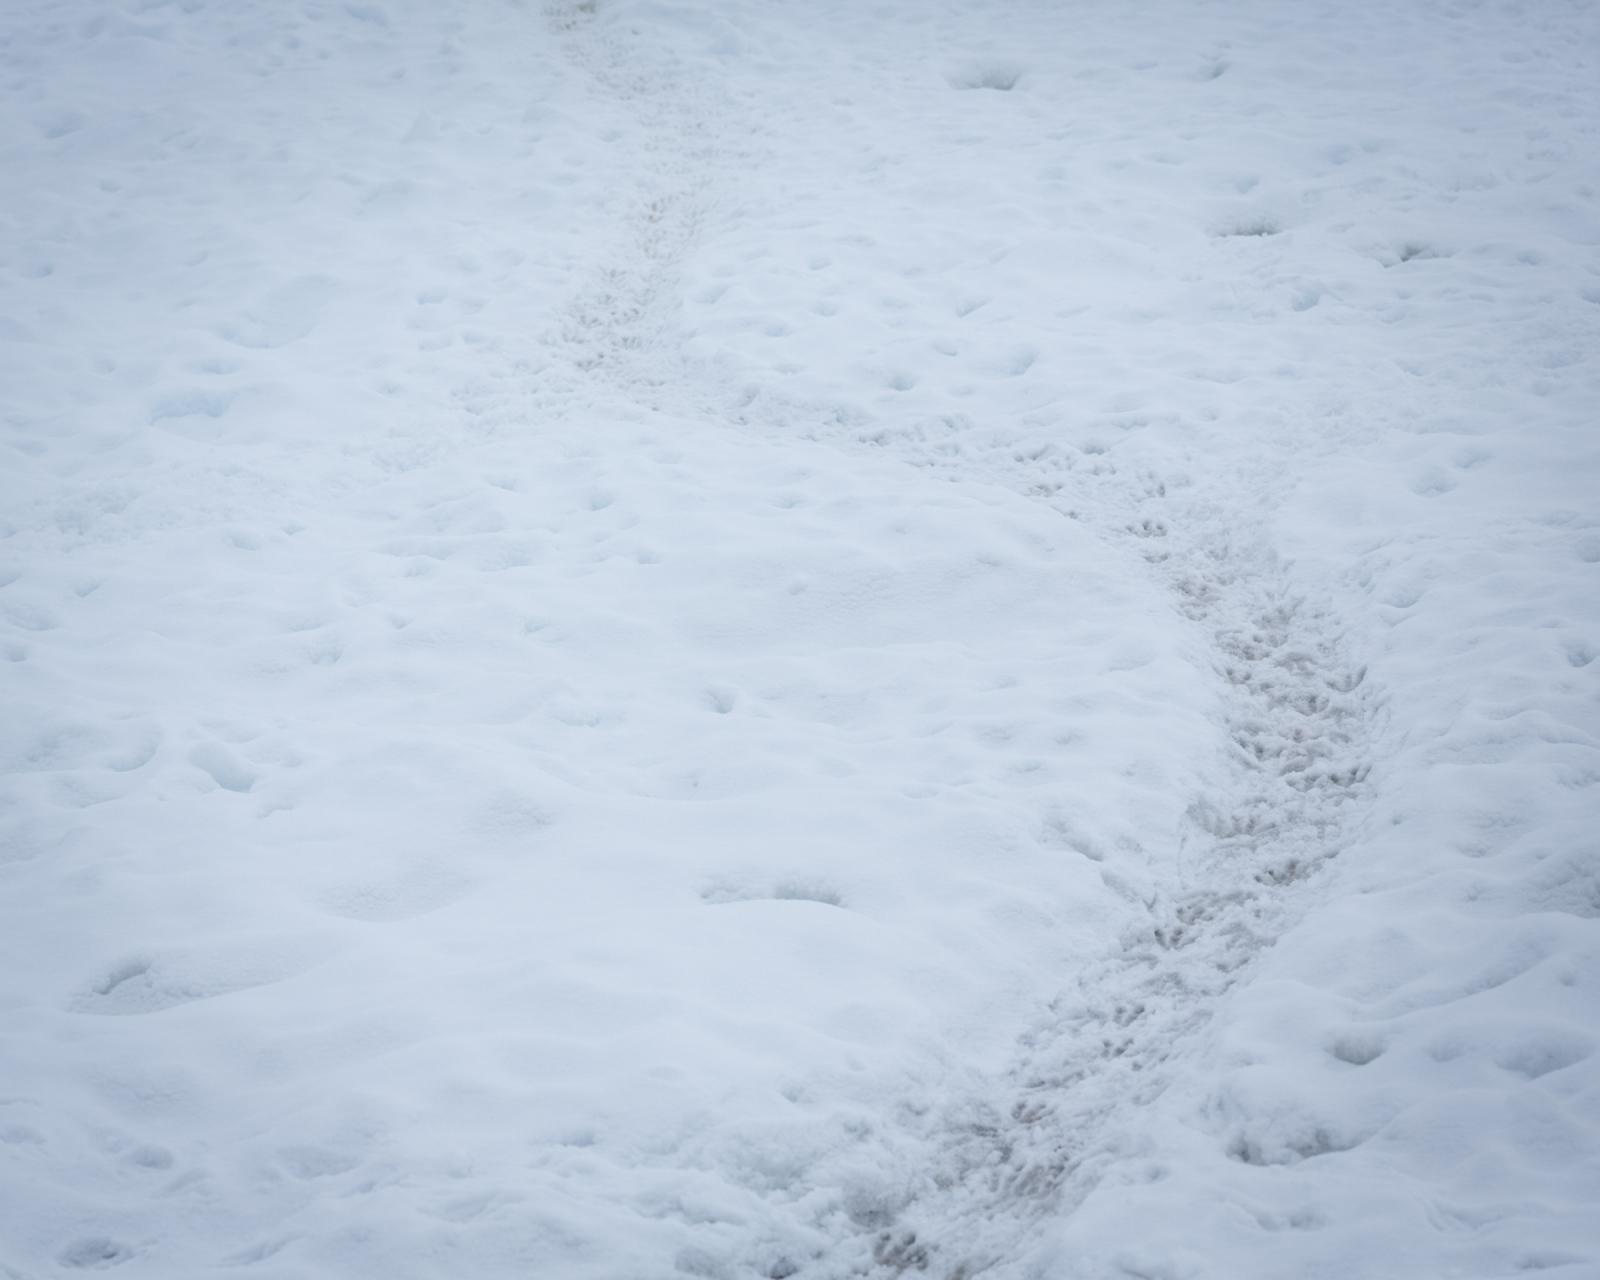 Art and Documentary Photography - Loading 0_Antarctica_UPLOAD_acaciajohnson_22.jpg